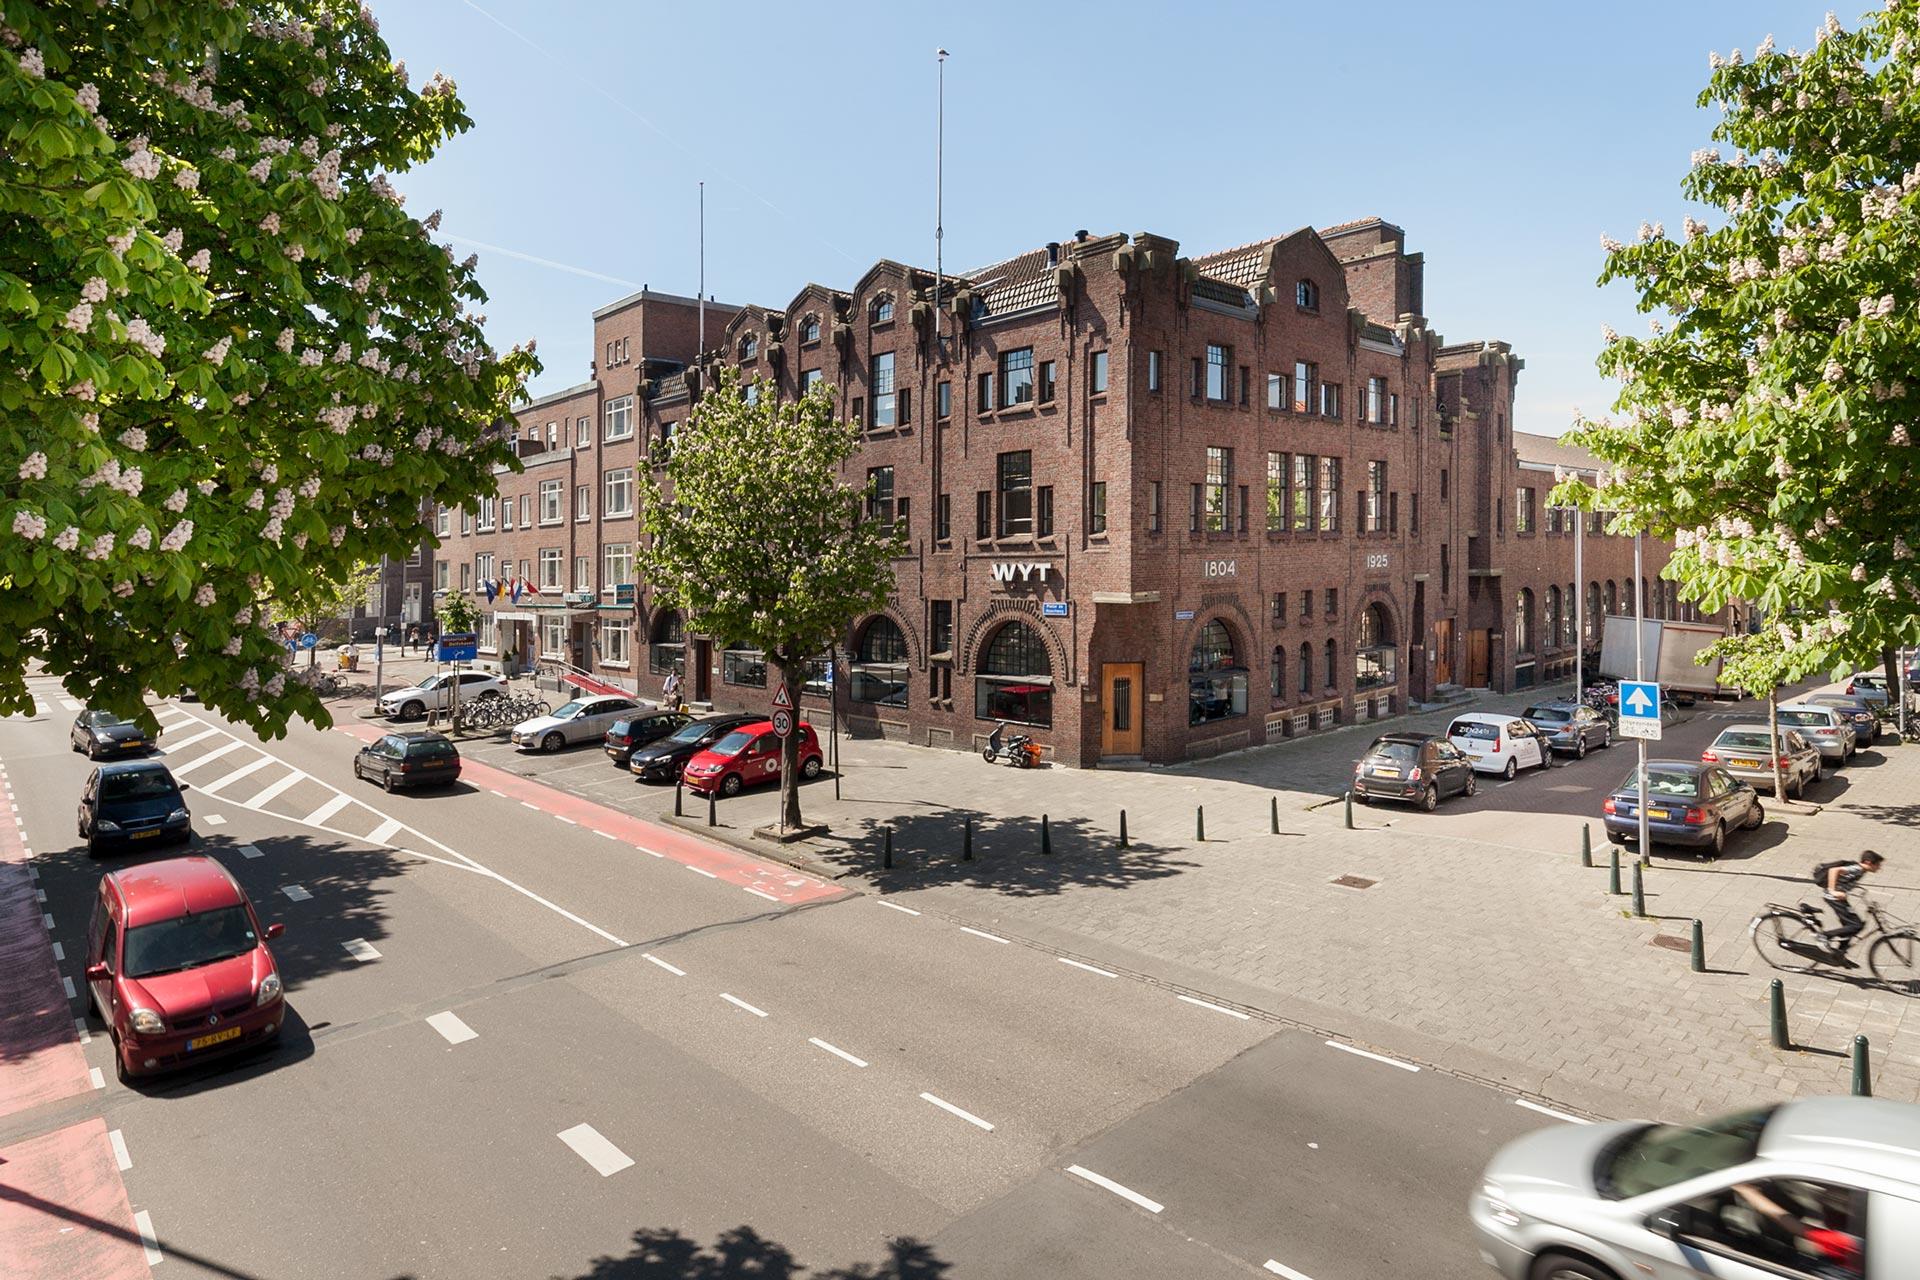 LAGADO-architects-office-WYT-drukkerij-Dunantstraat-Rotterdam